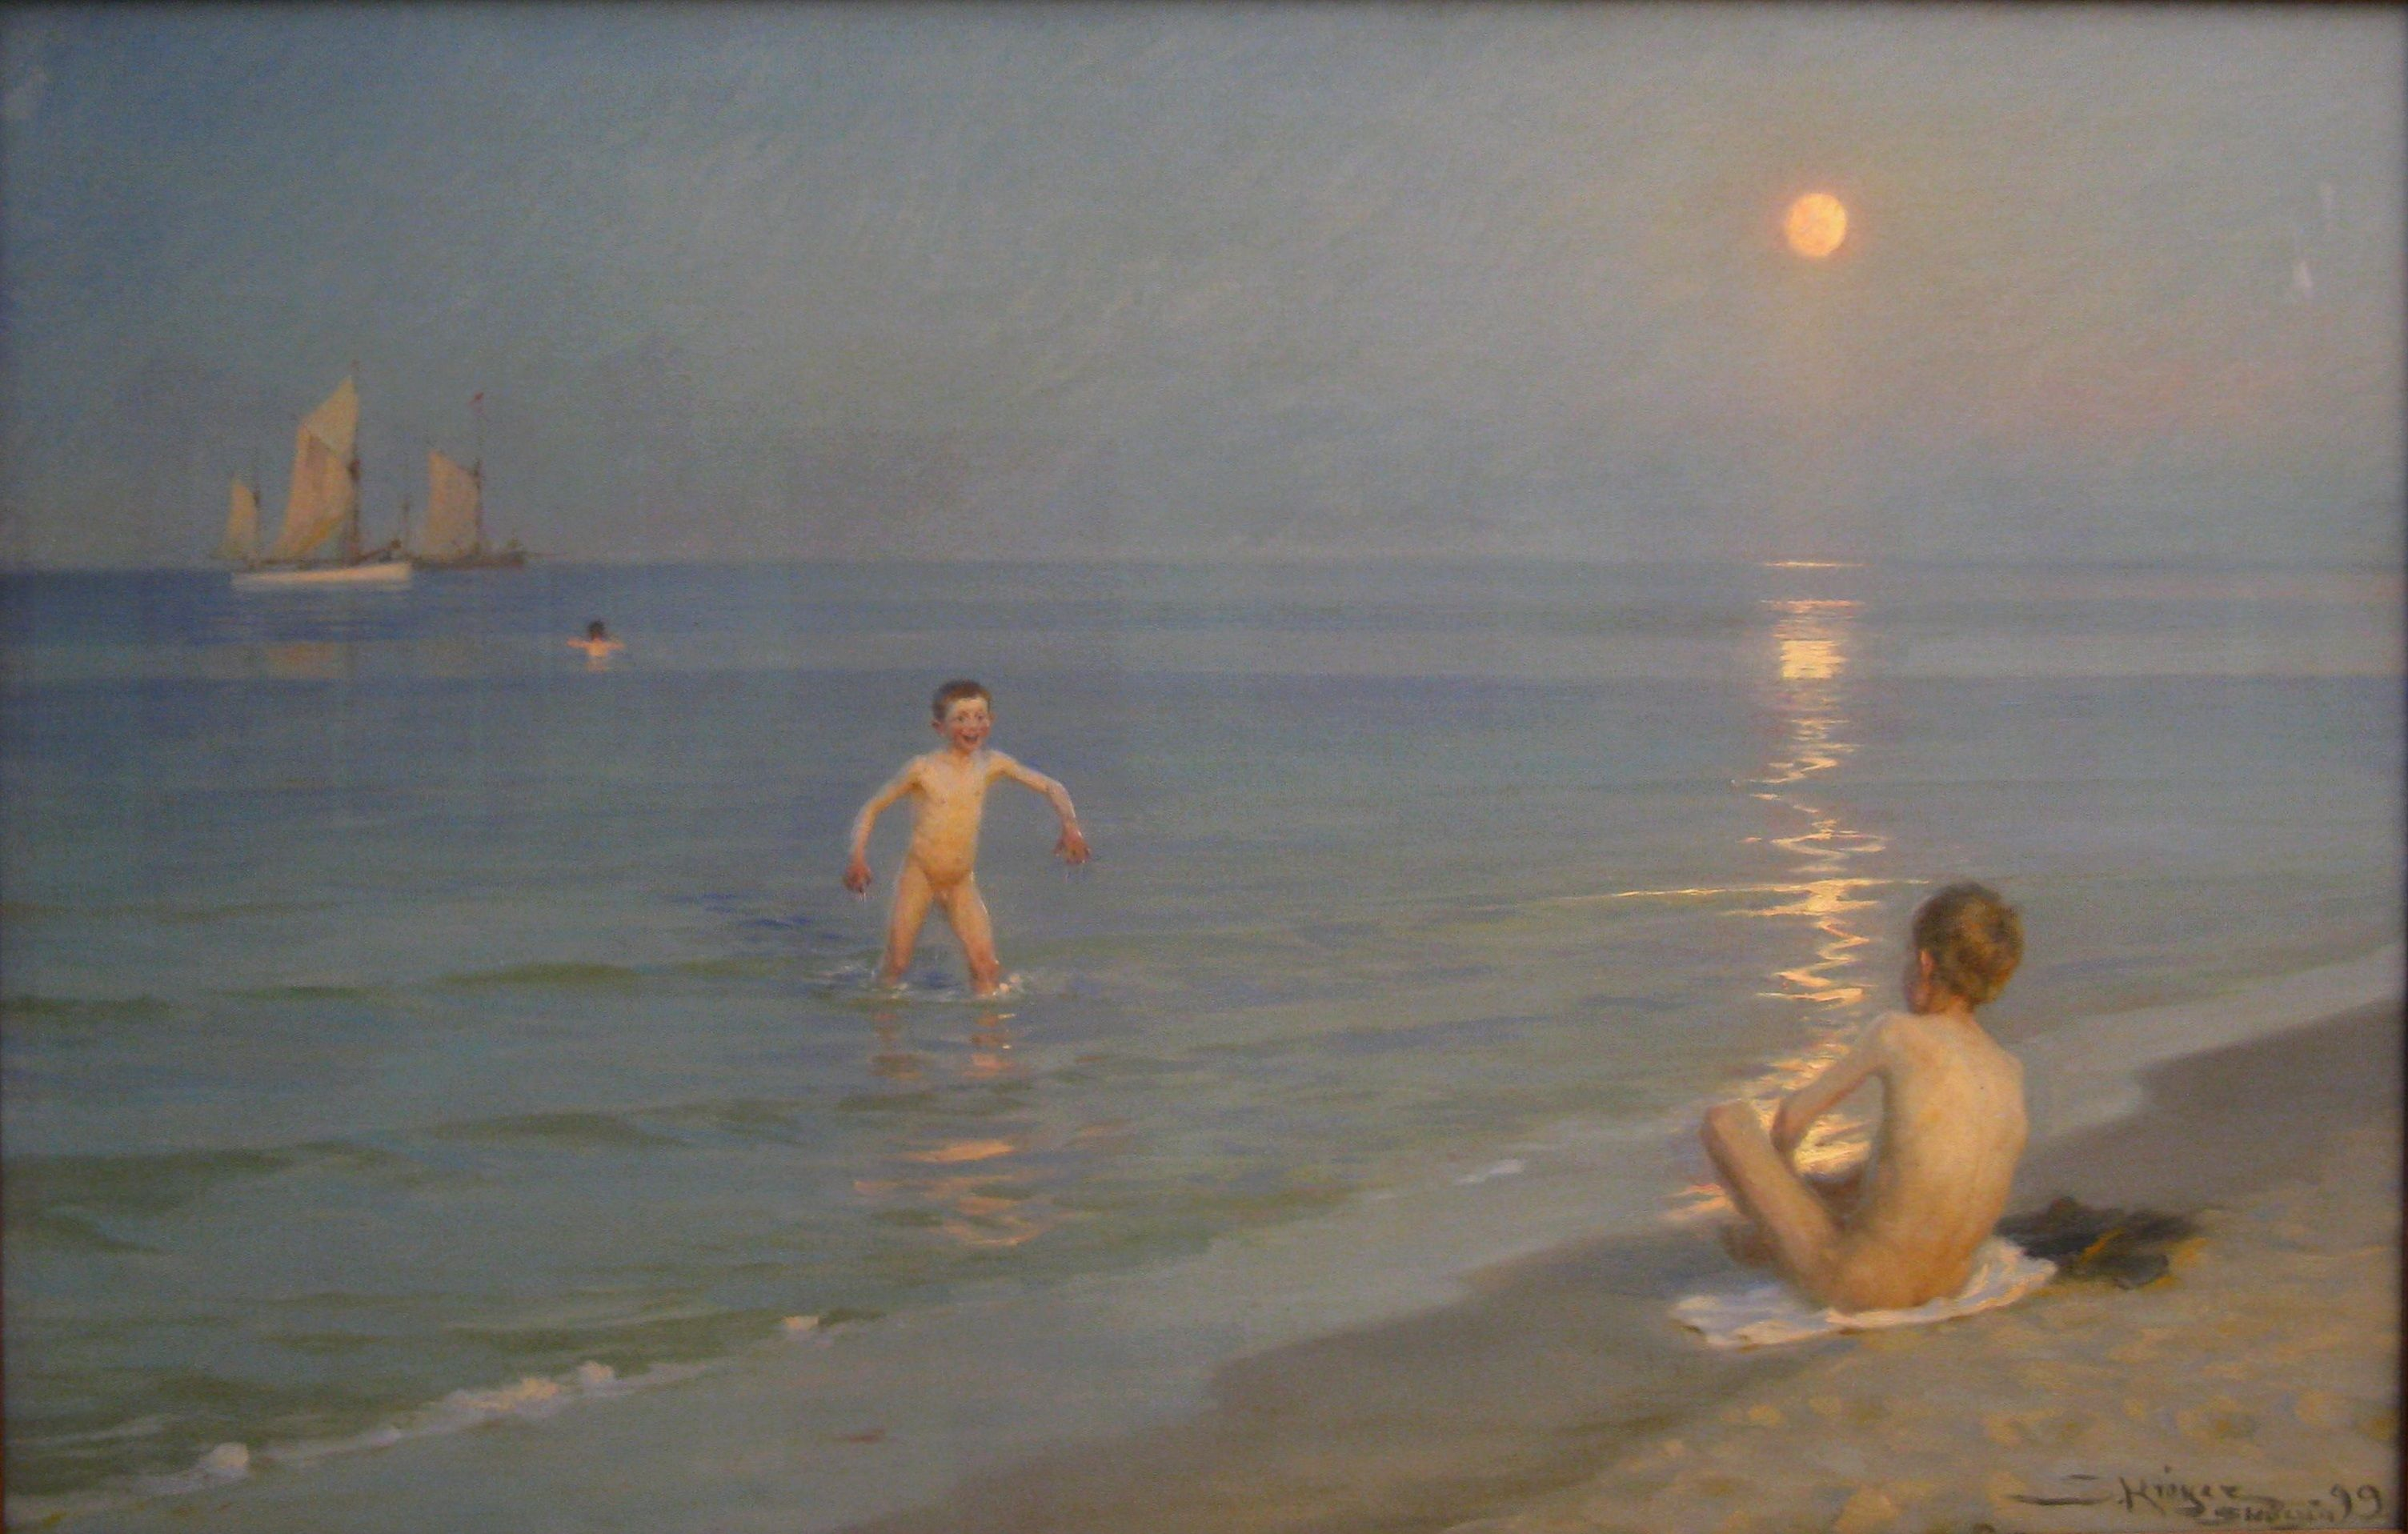 peder severin kroyer Boys_bathing_in_Skagen_summer_evening-Statens_Museum_for_Kunst